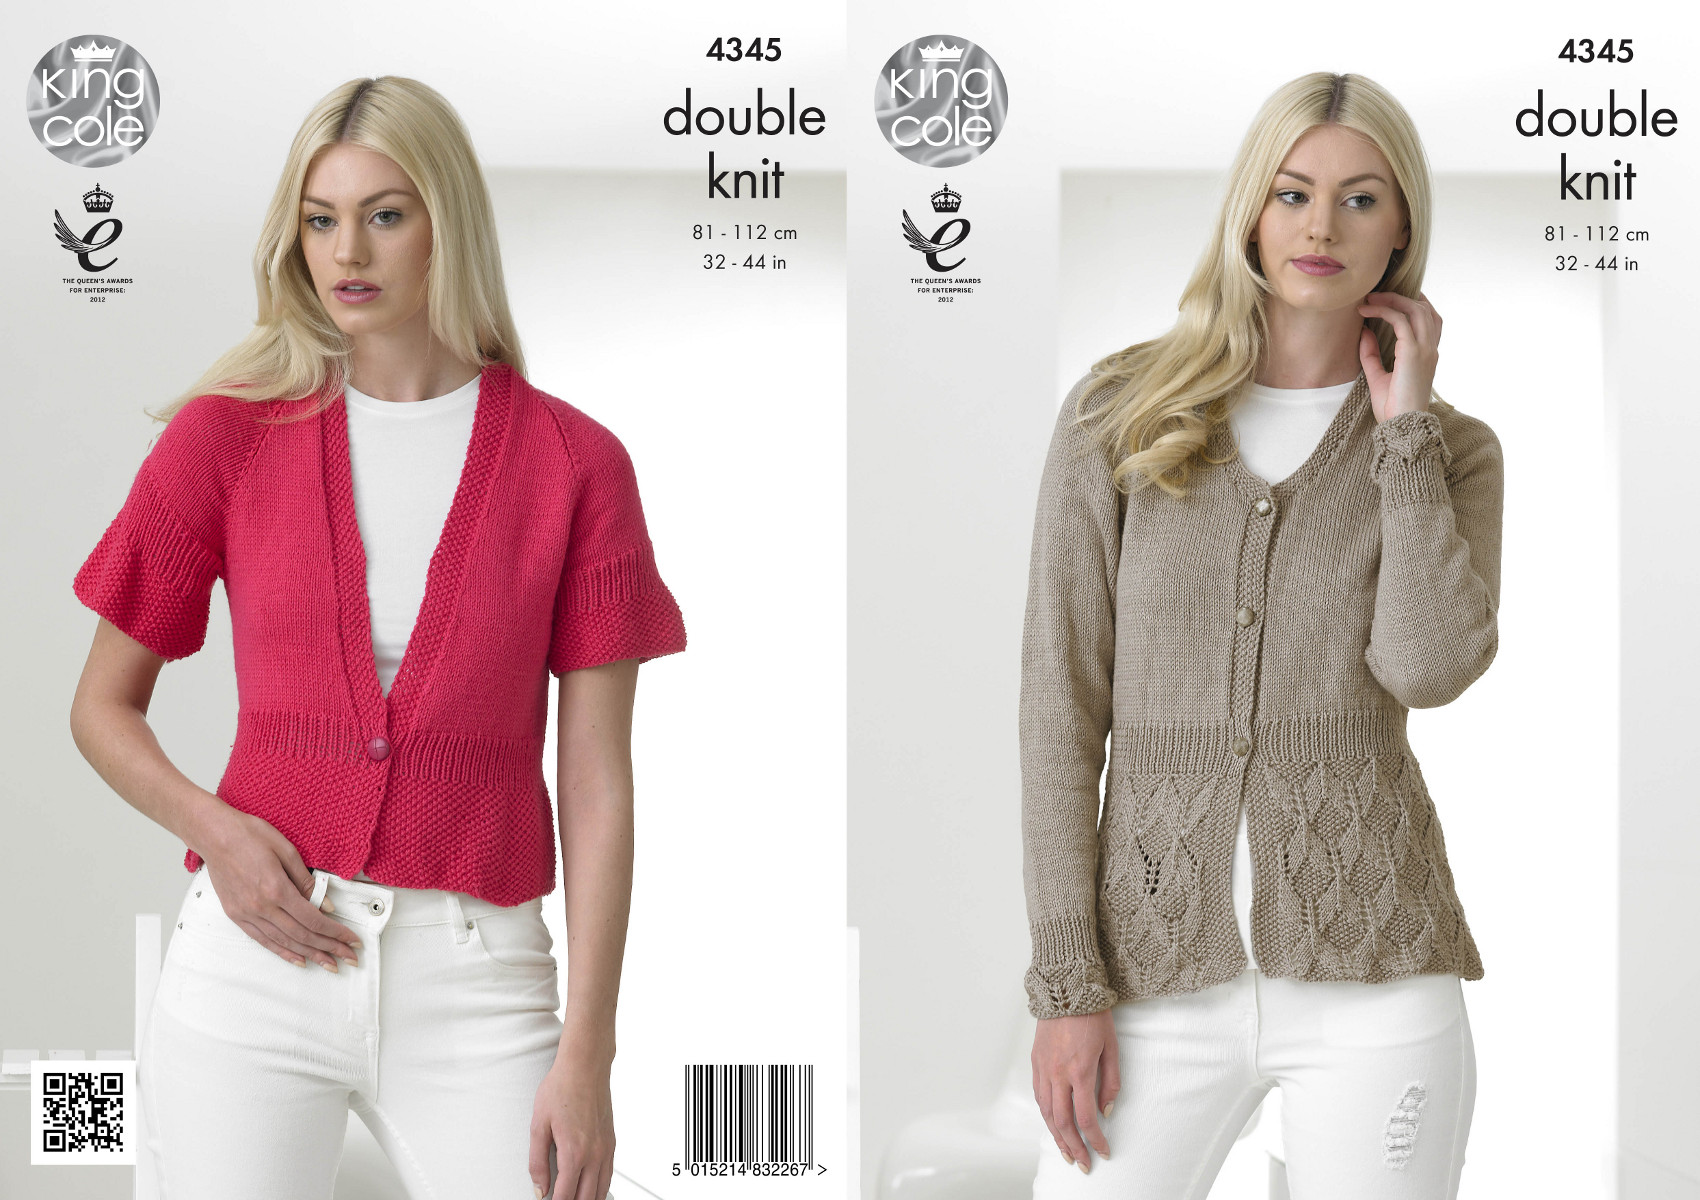 Knitting Pattern Ladies Short Sleeve Cardigan : King Cole Ladies Double Knitting DK Pattern Long or Short Sleeve Cardigans 43...